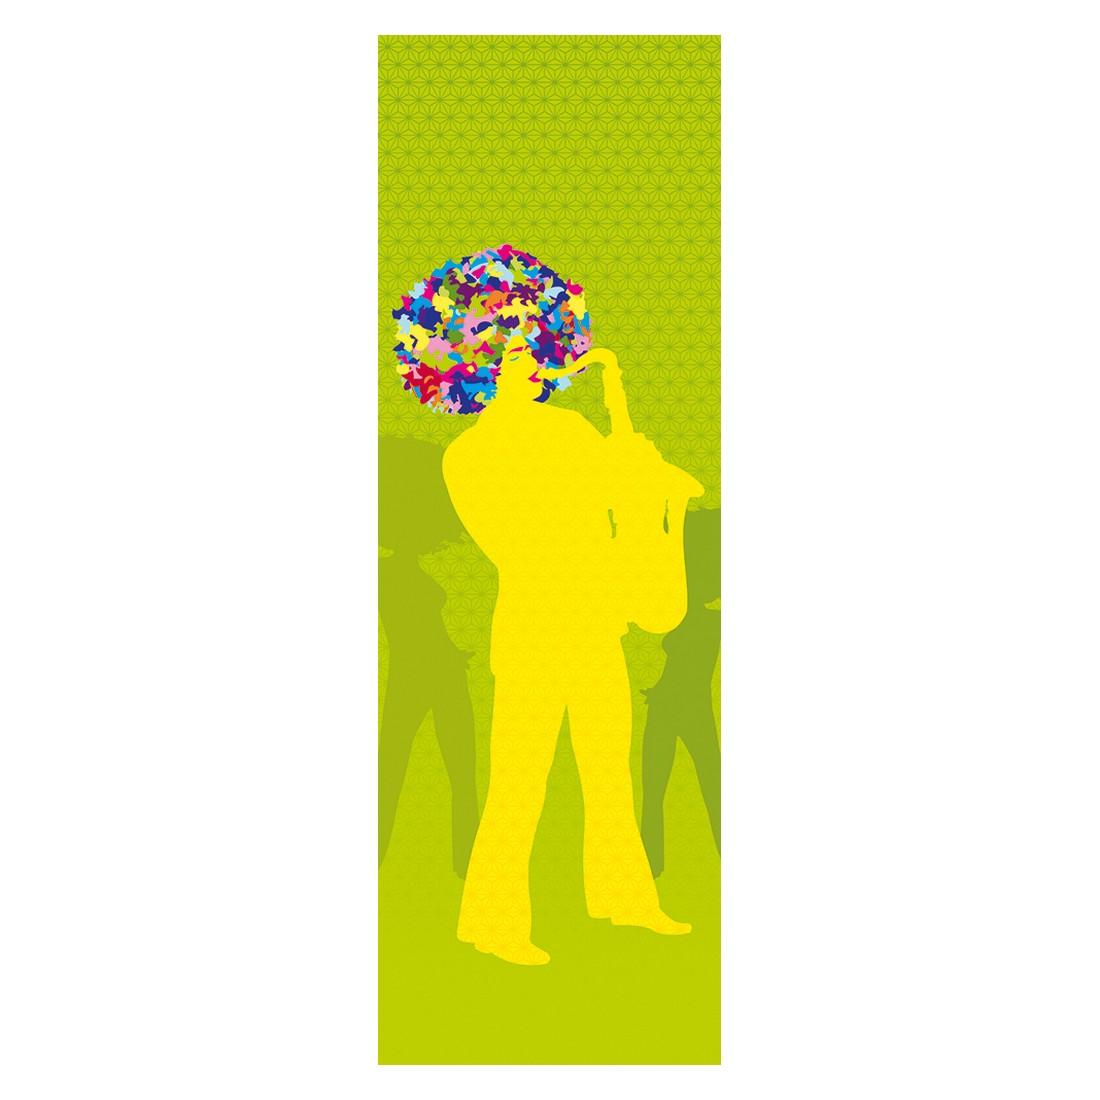 Decopanel Funky vibes green – grün, gelb, bunt – glatt, Architects Paper jetzt kaufen